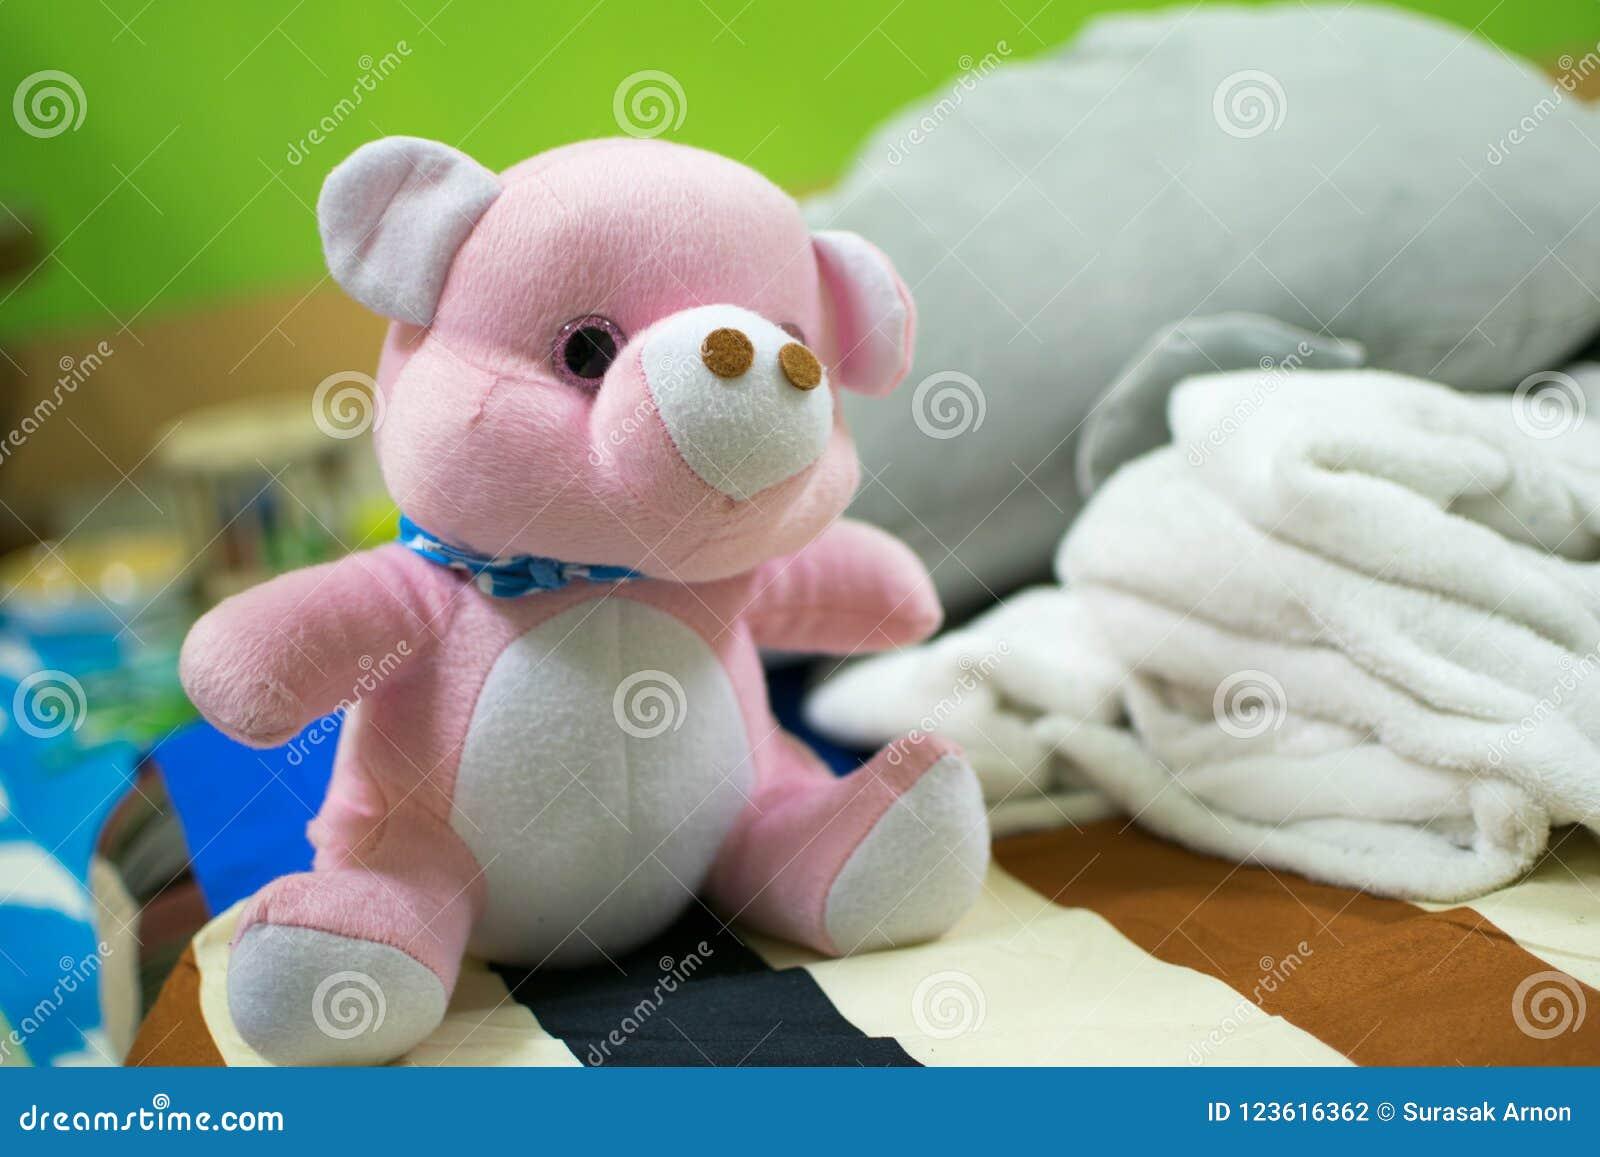 Rosa Teddybär gesetzt auf das Bett